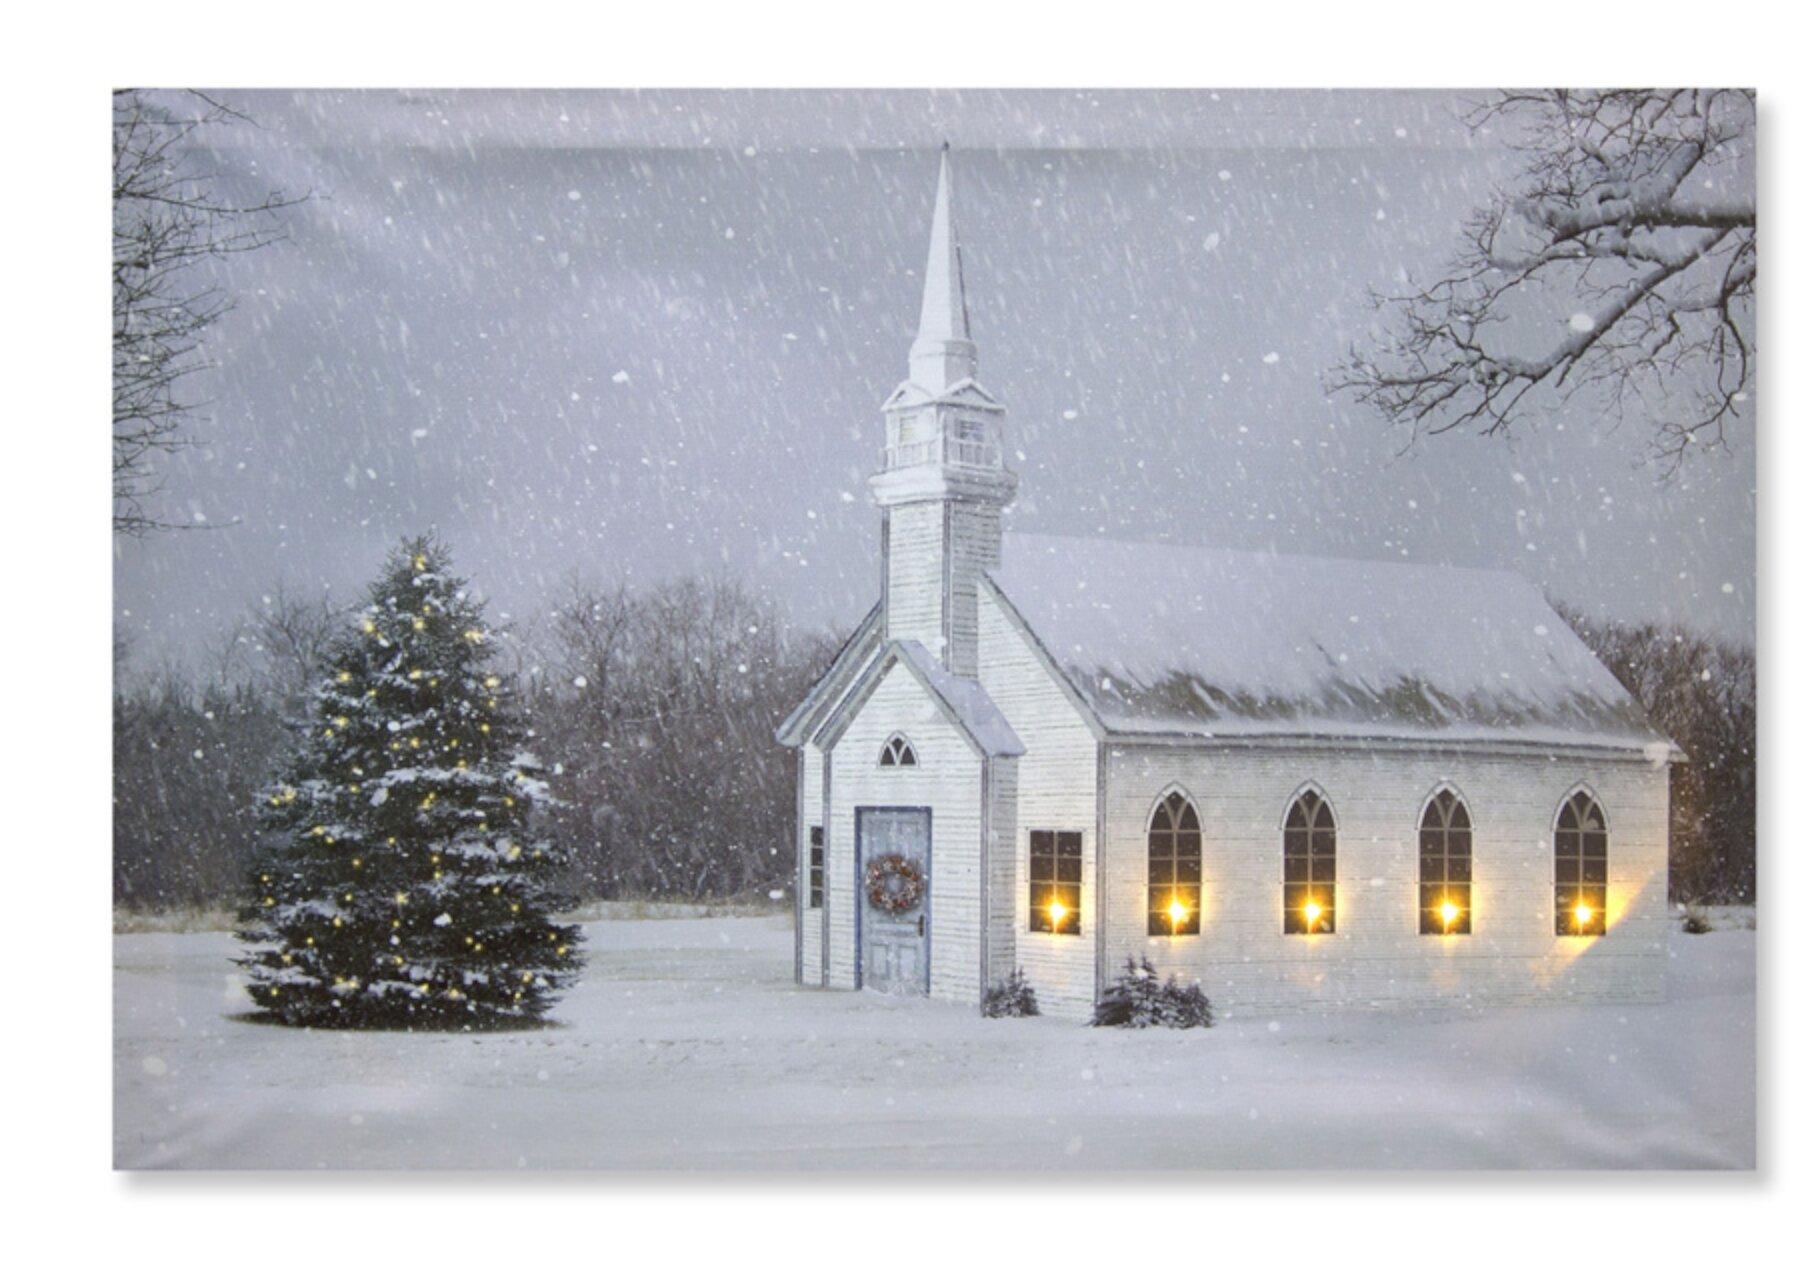 The Holiday Aisle Church And Tree Led Canvas 23 75 L X 15 75 H Wood Canvas Wayfair